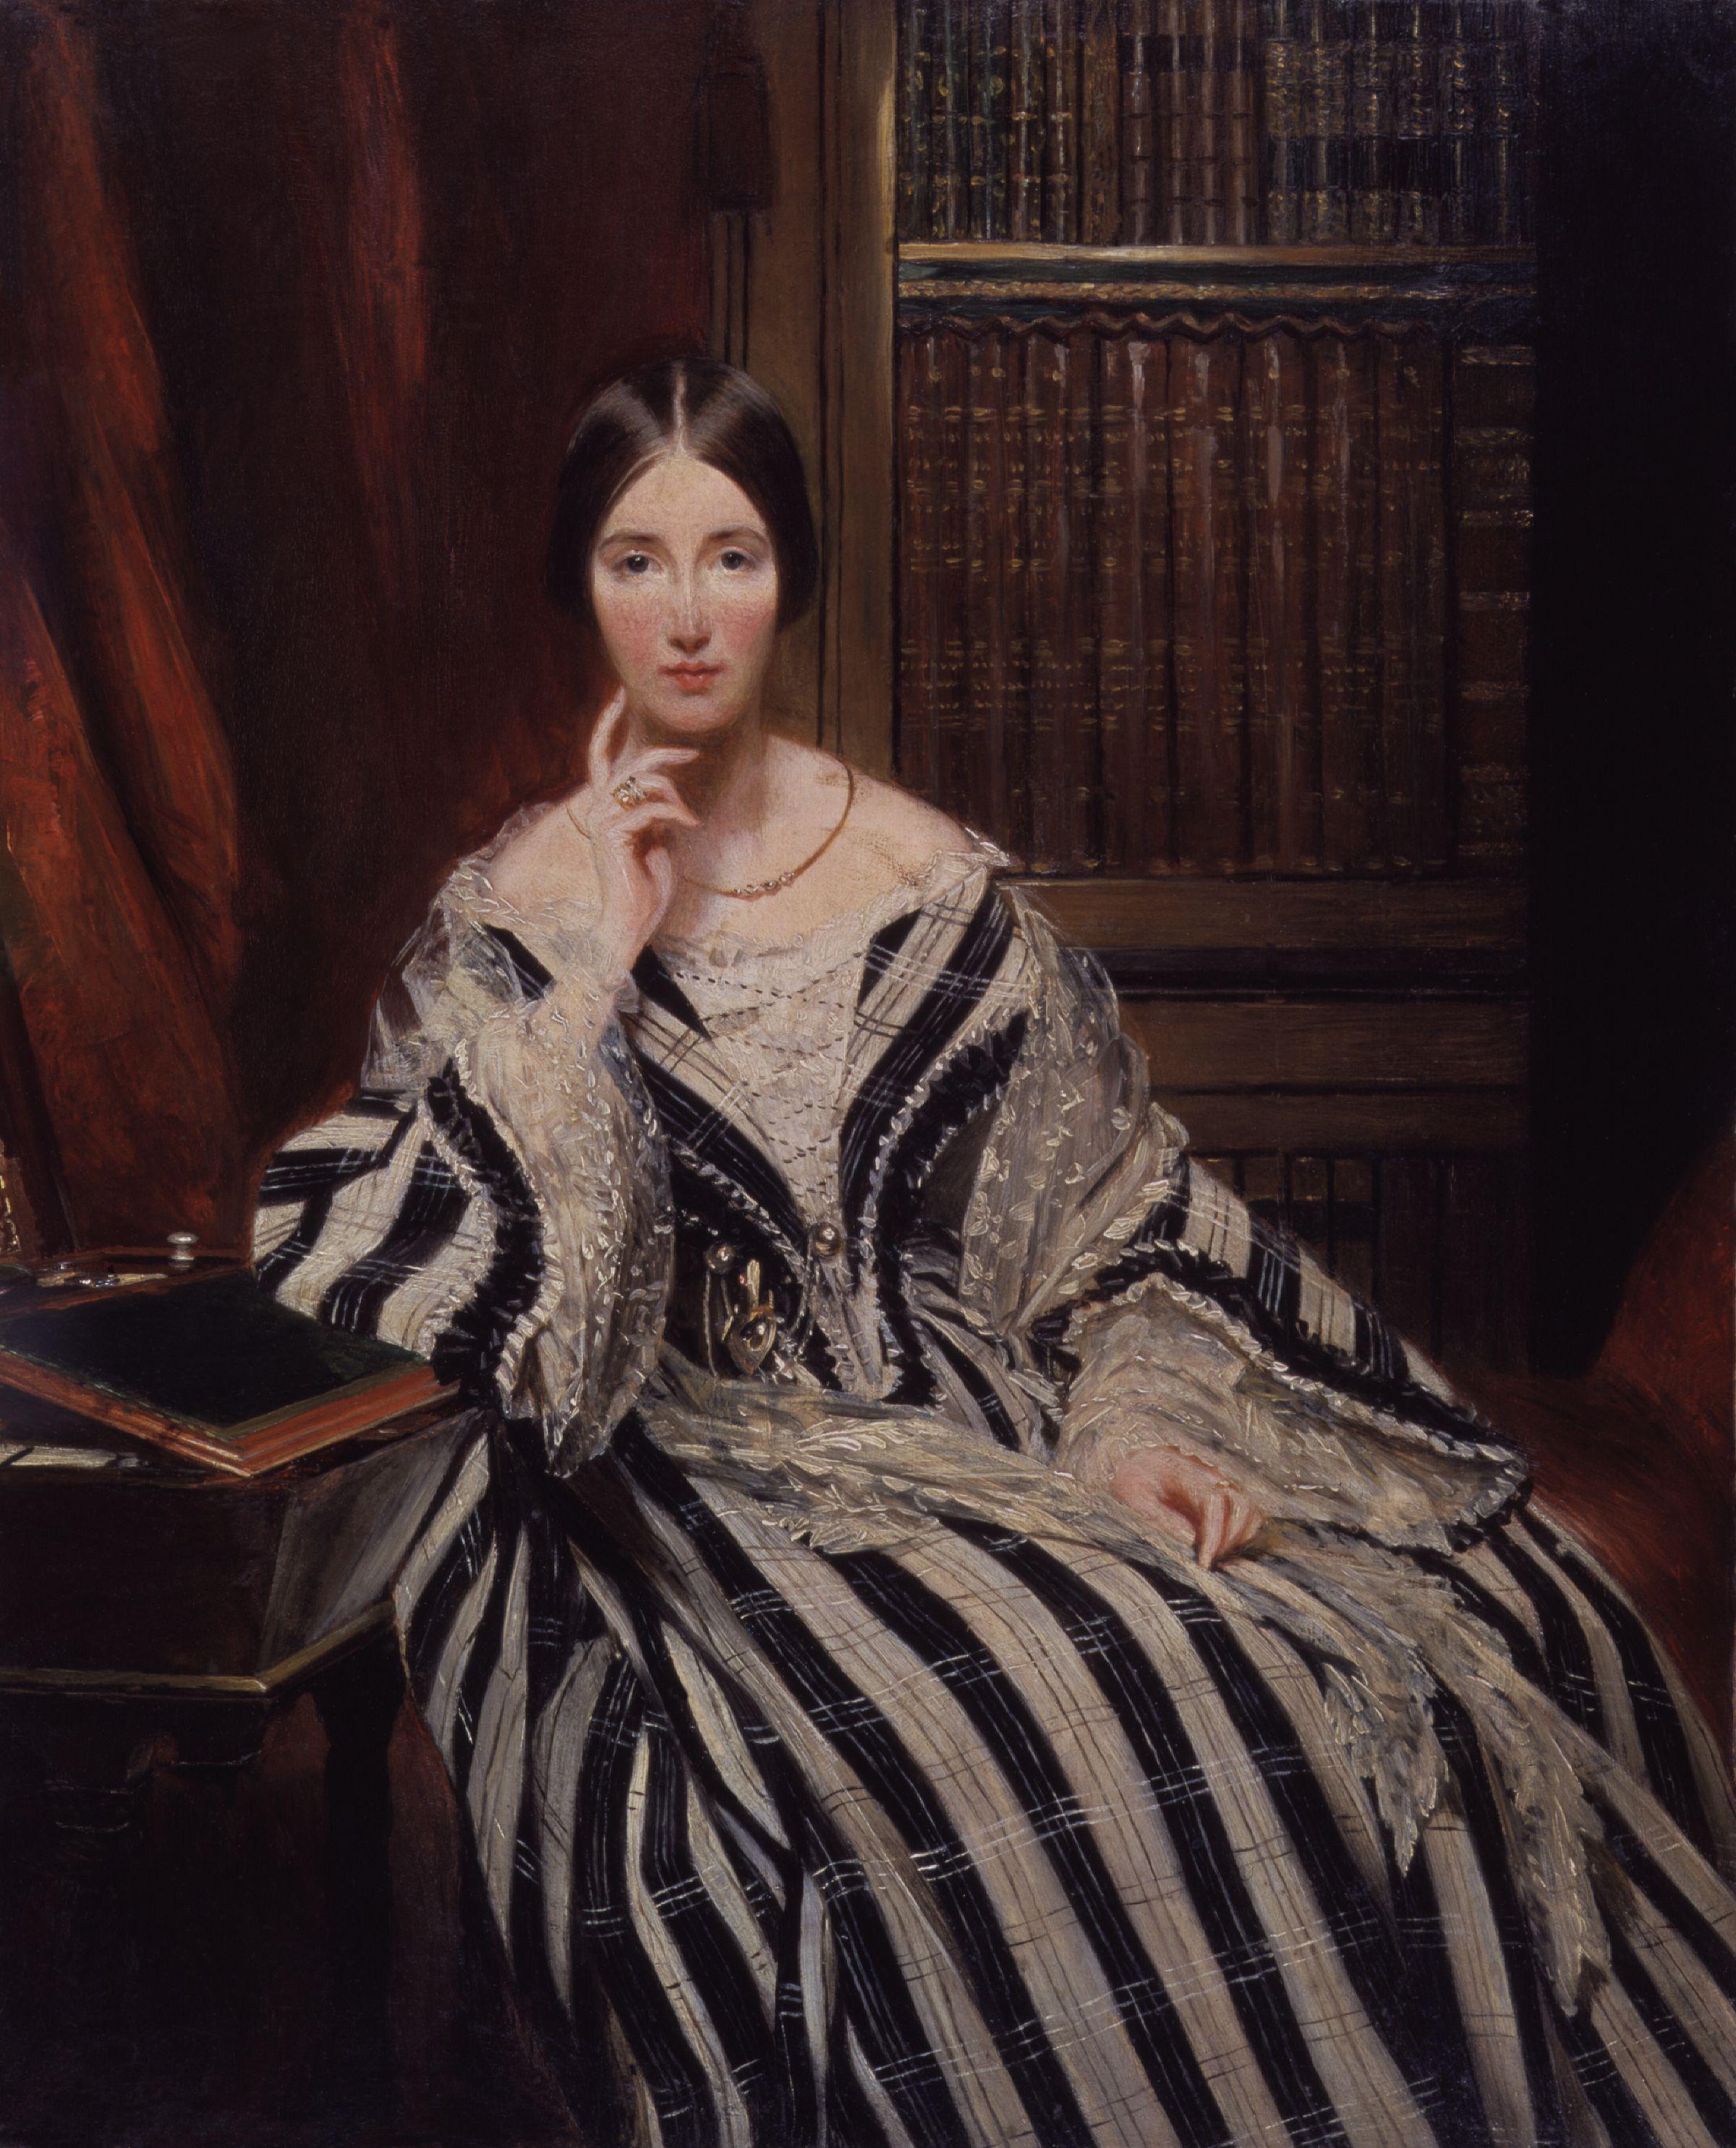 Angela Lewis Wikipedia angela burdett-coutts, 1st baroness burdett-coutts - wikipedia